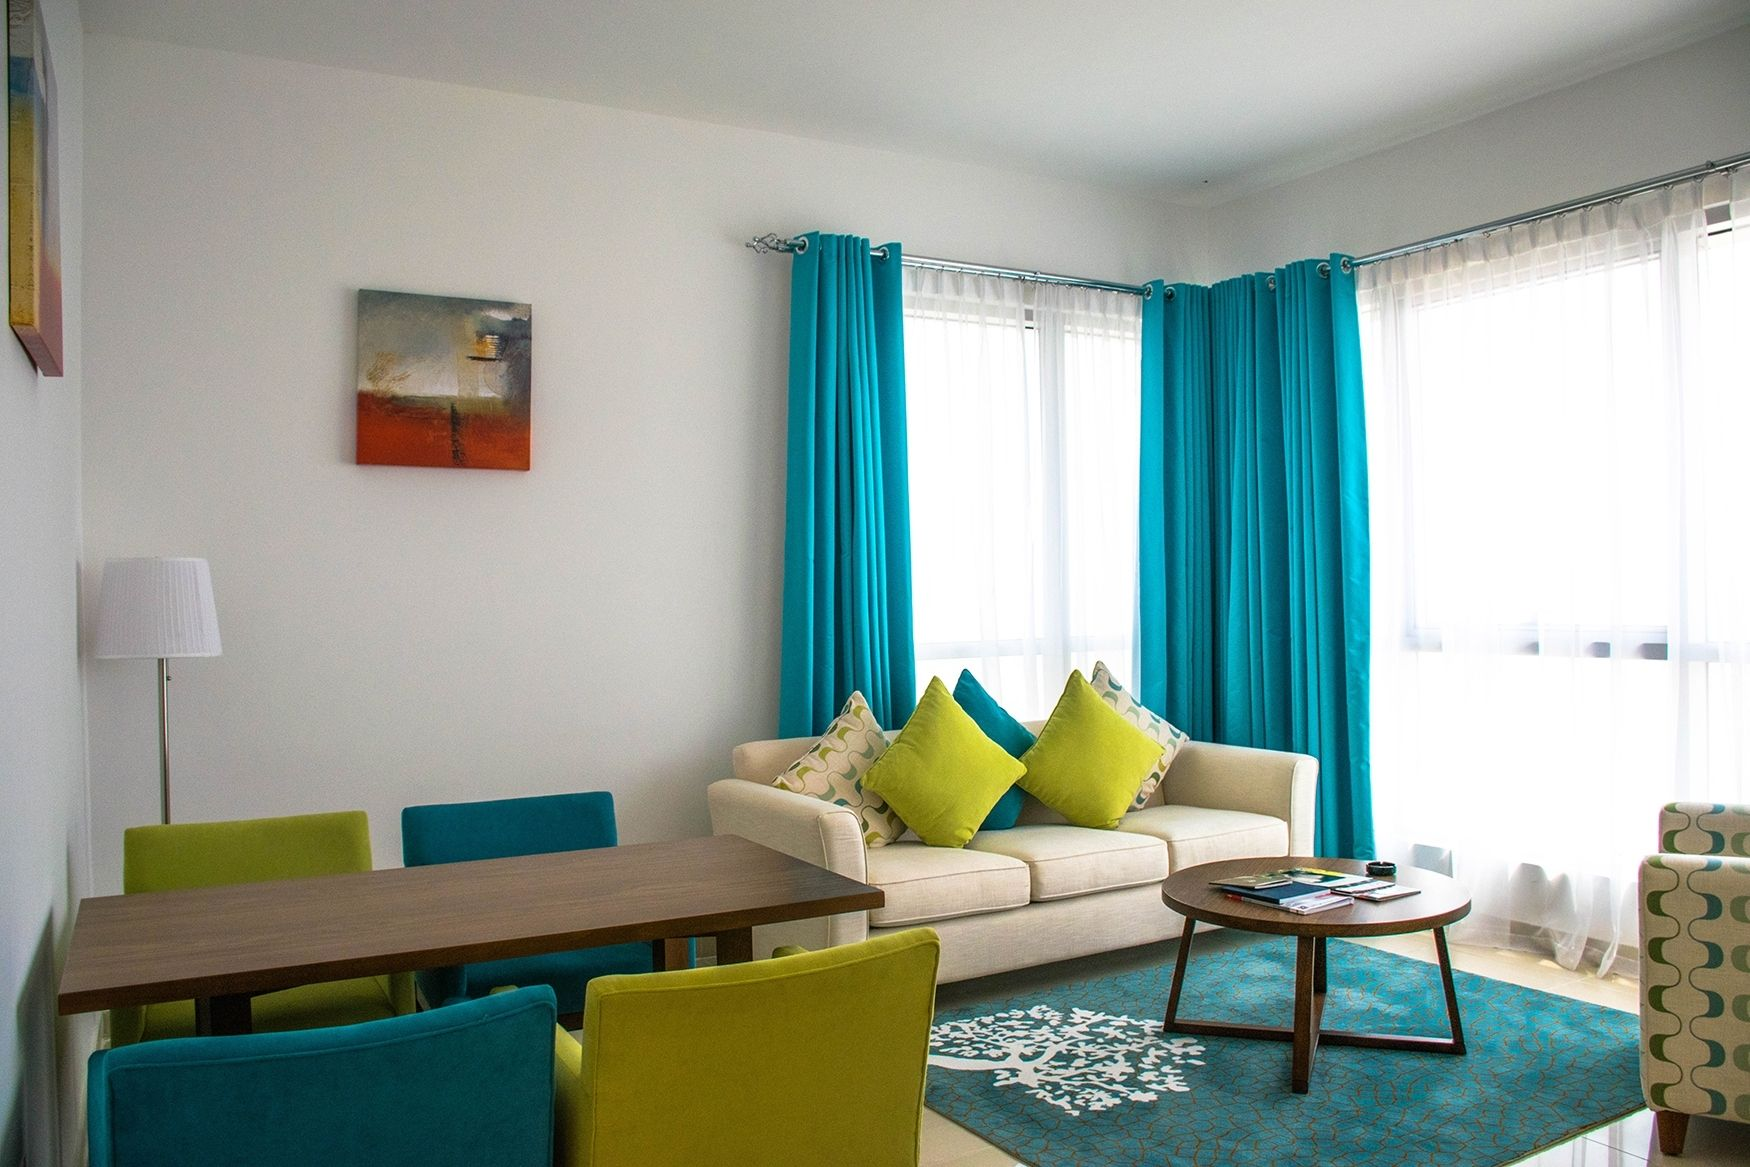 curtain color ideas living room coastal design image of for decor curtains small